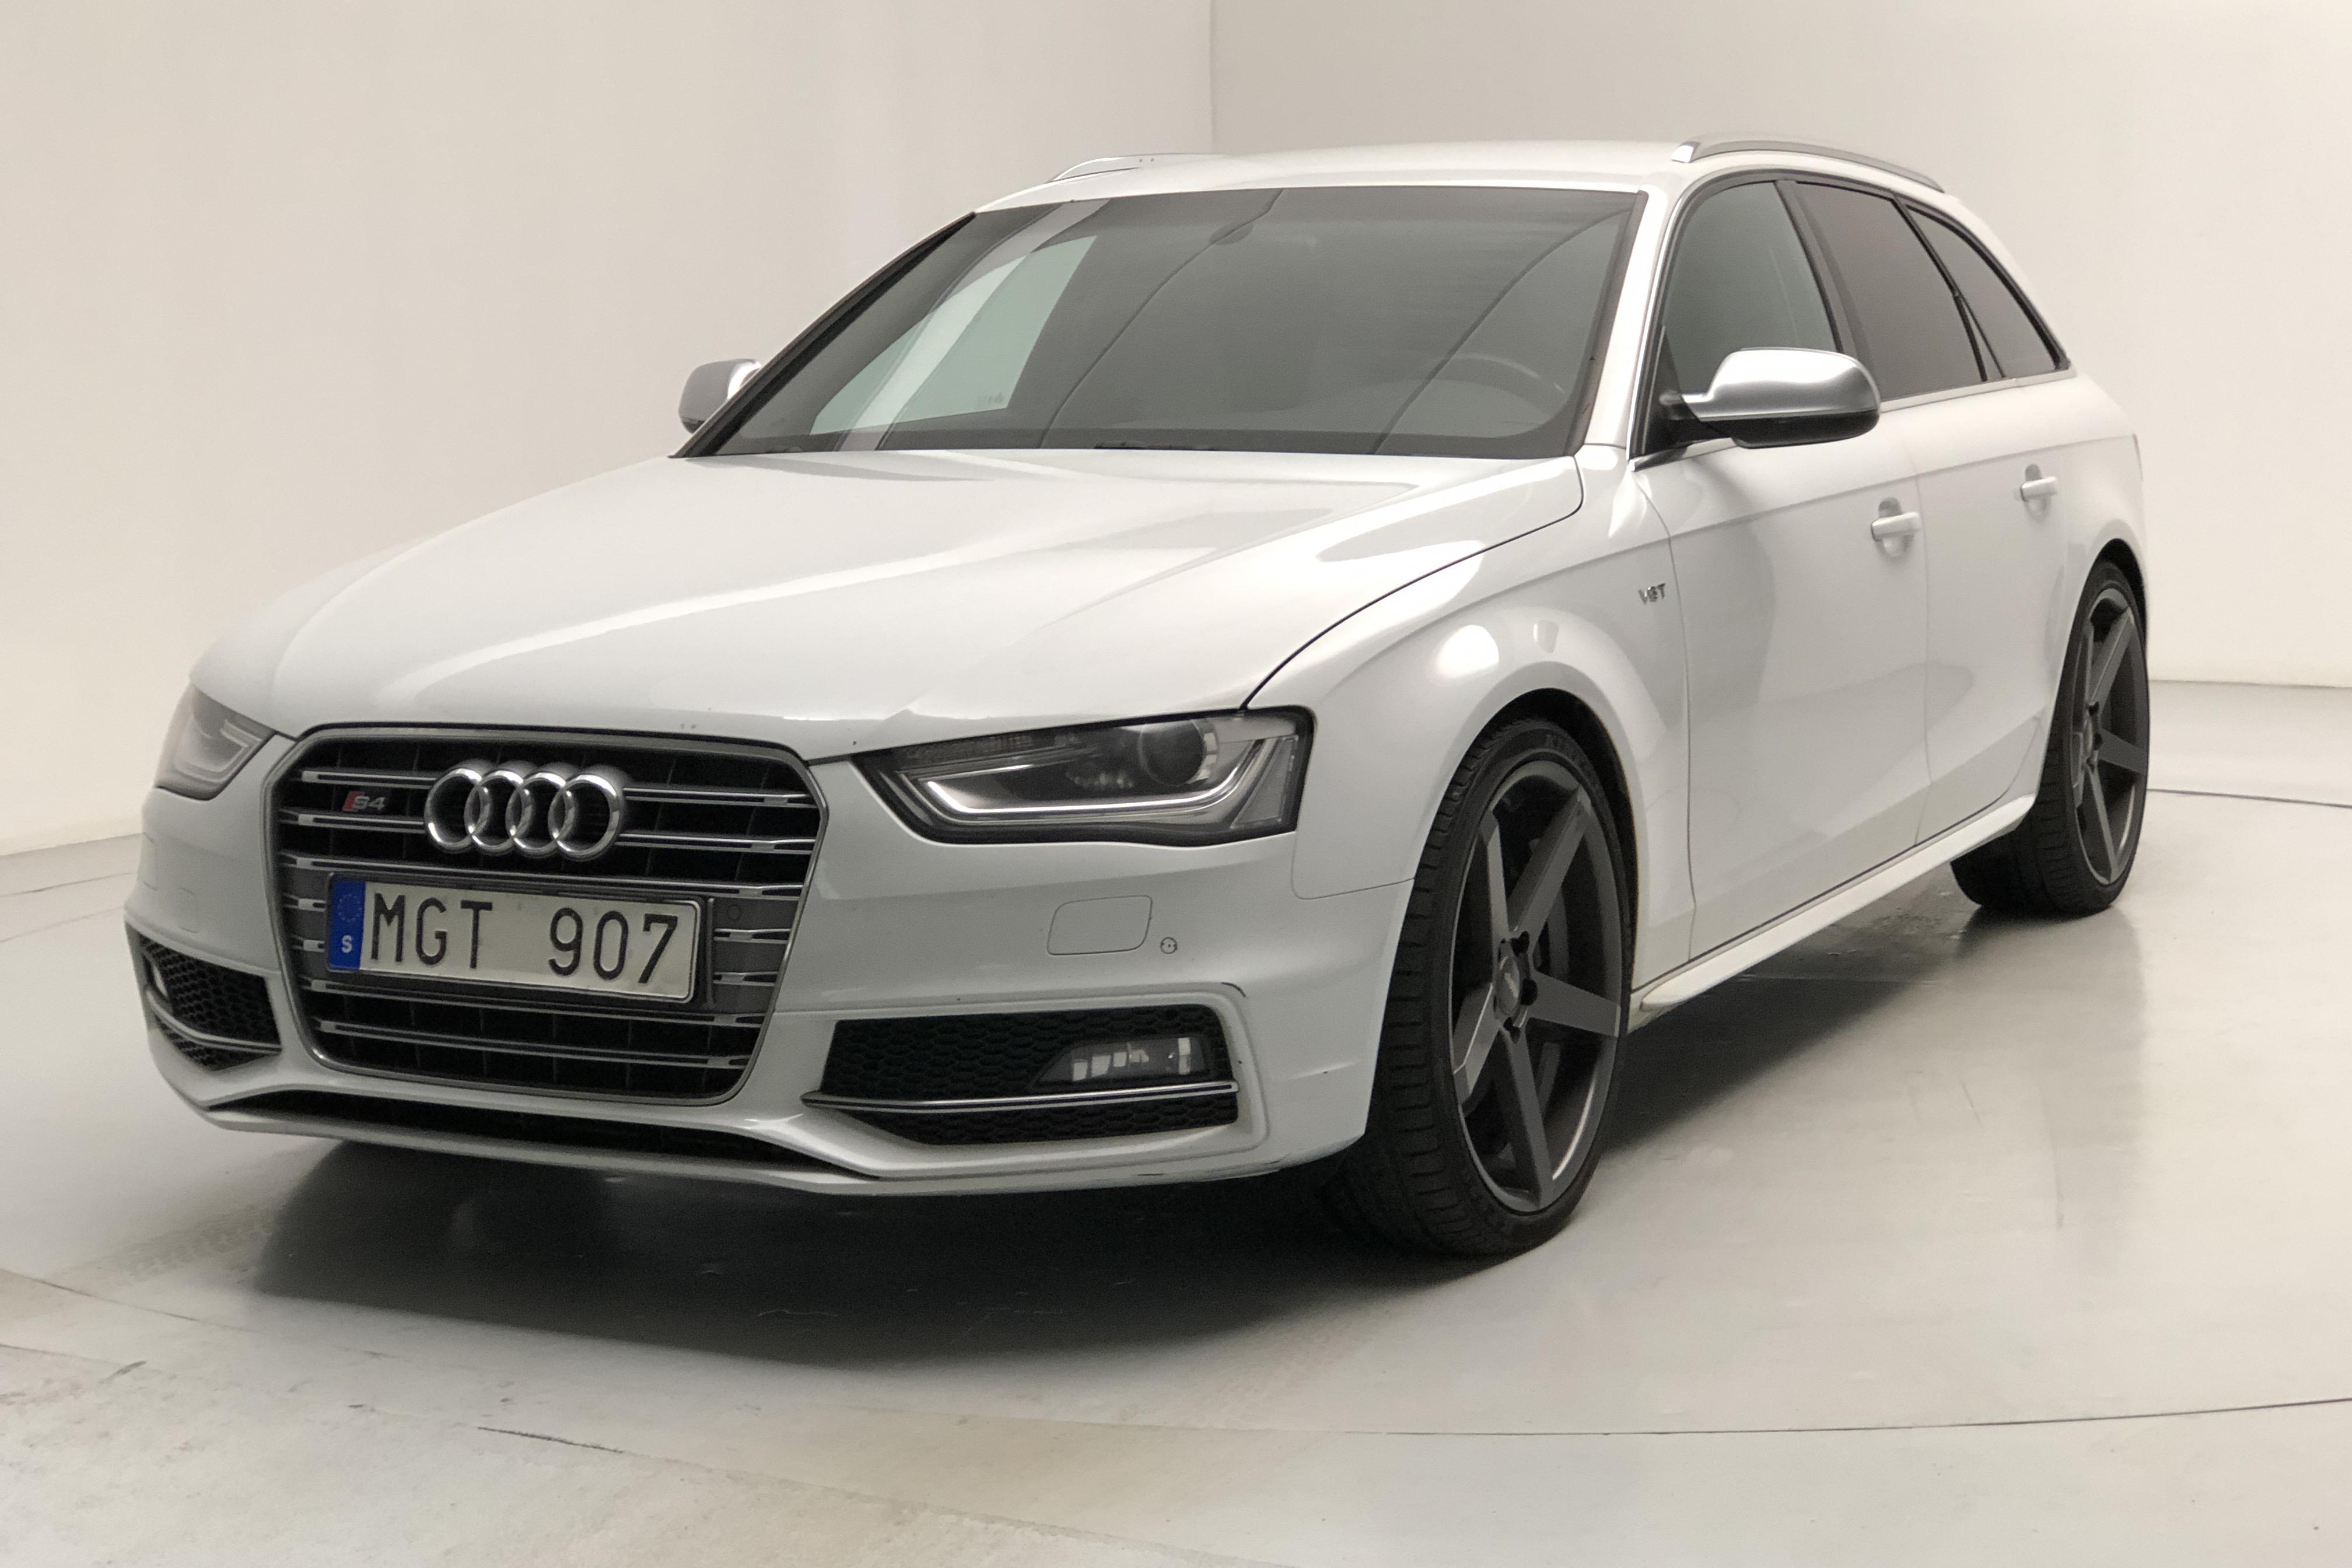 Audi S4 3.0 TFSI Avant (333hk) - 0 km - Automatic - white - 2013